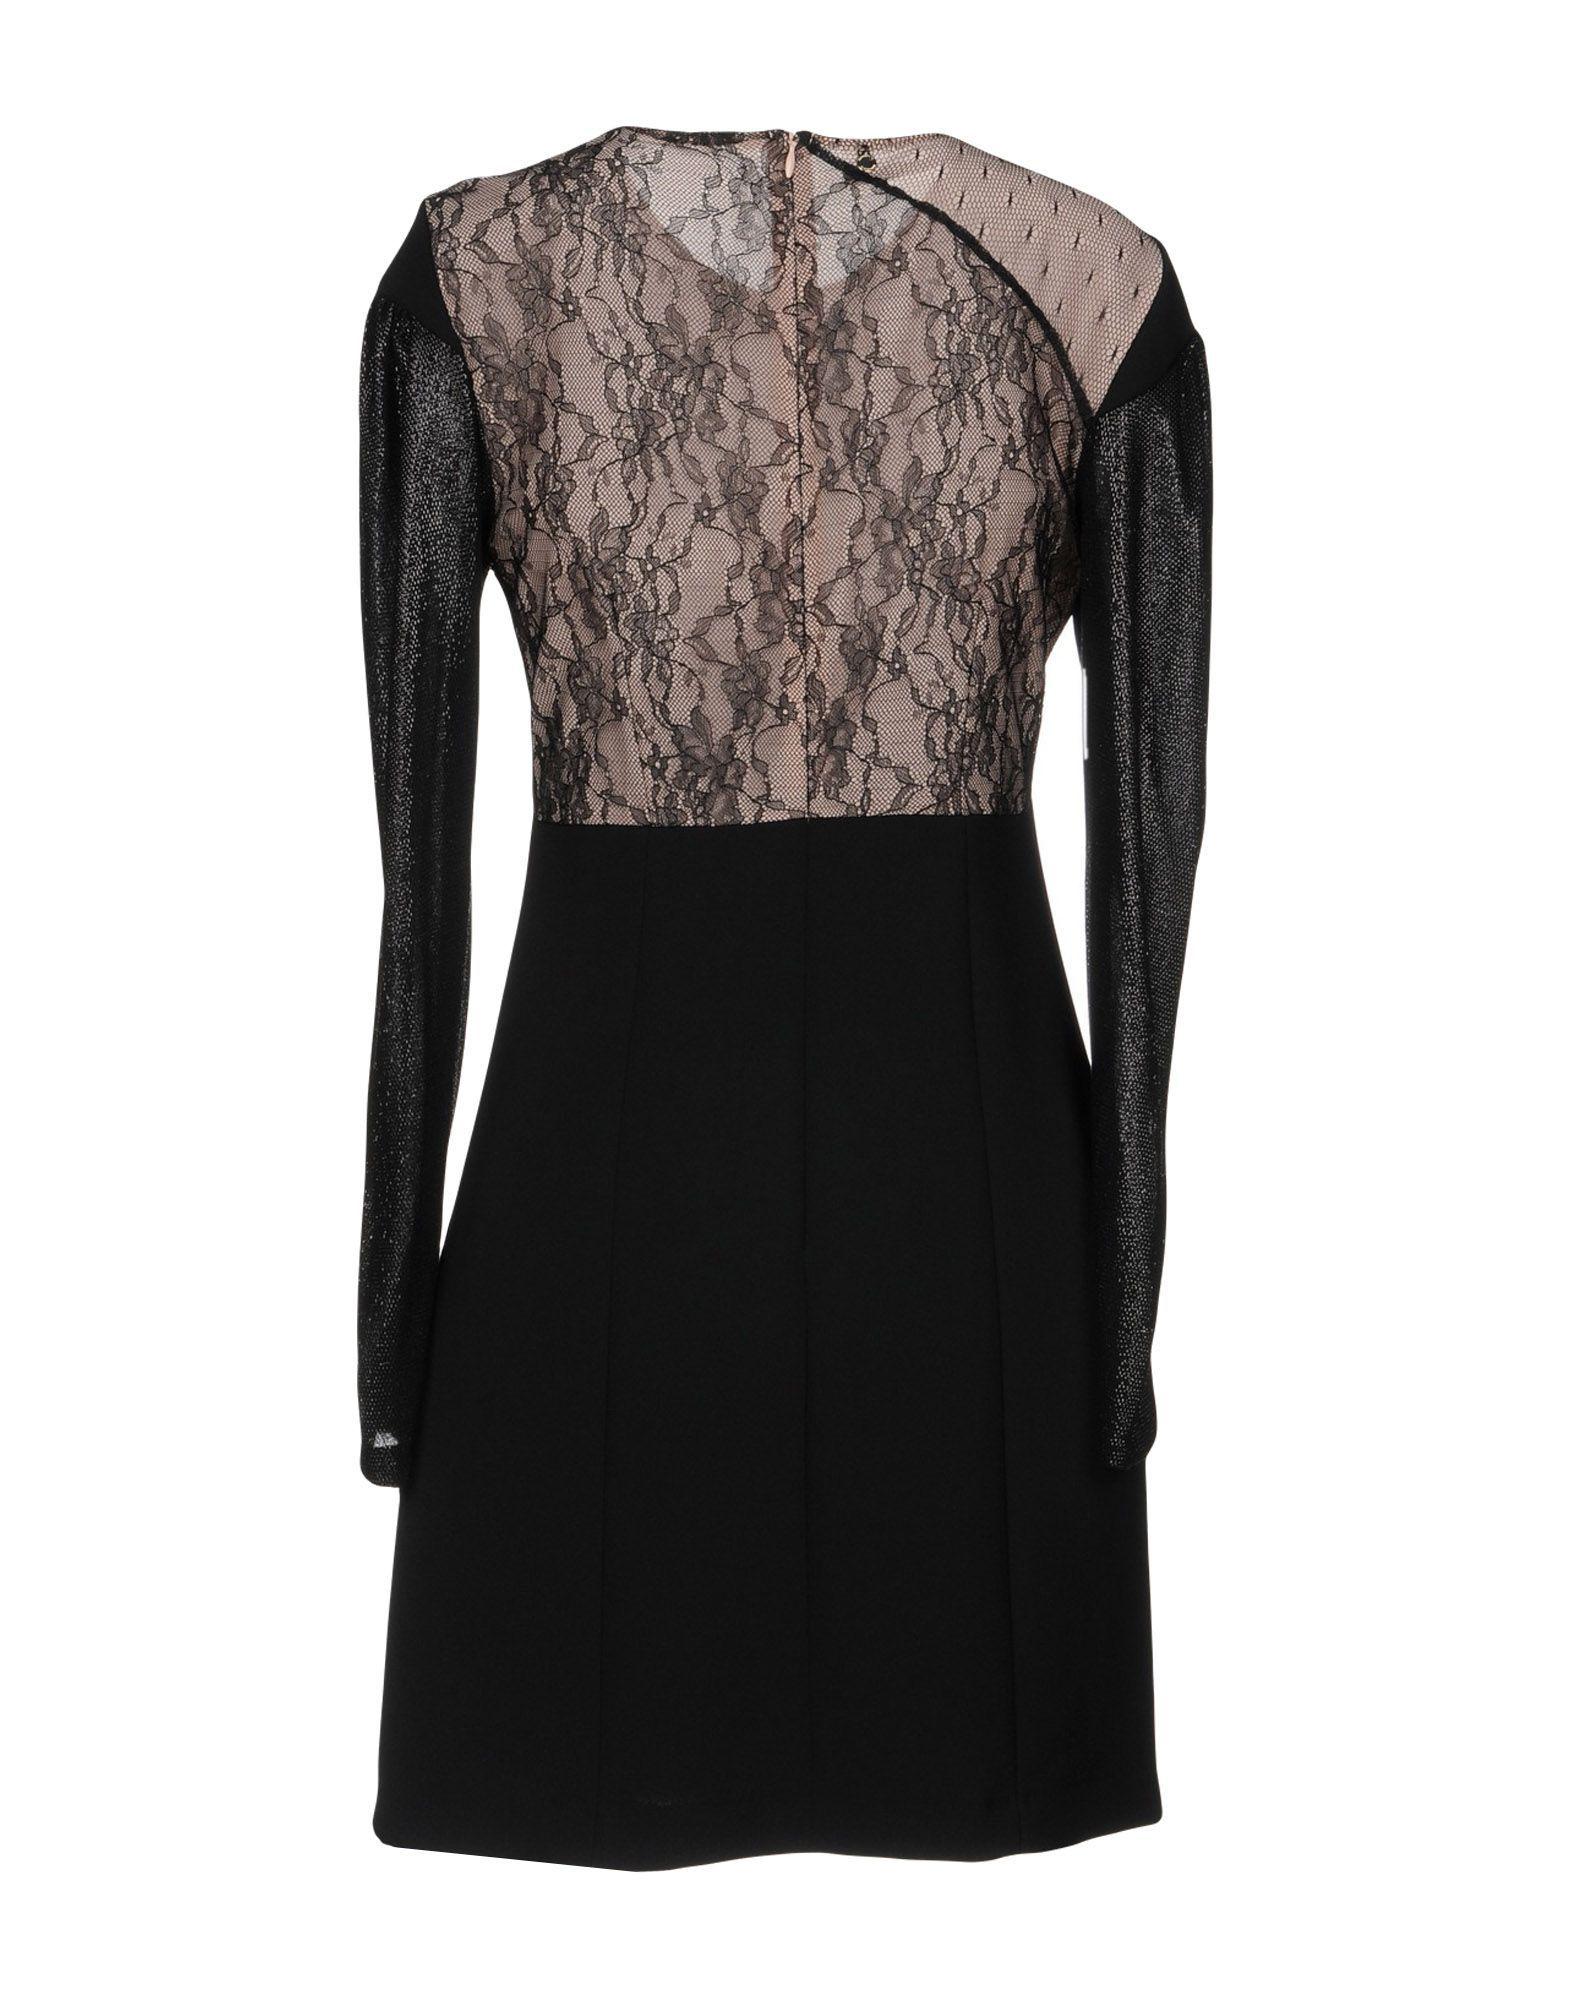 Annarita N Black Lace Long Sleeve Dress